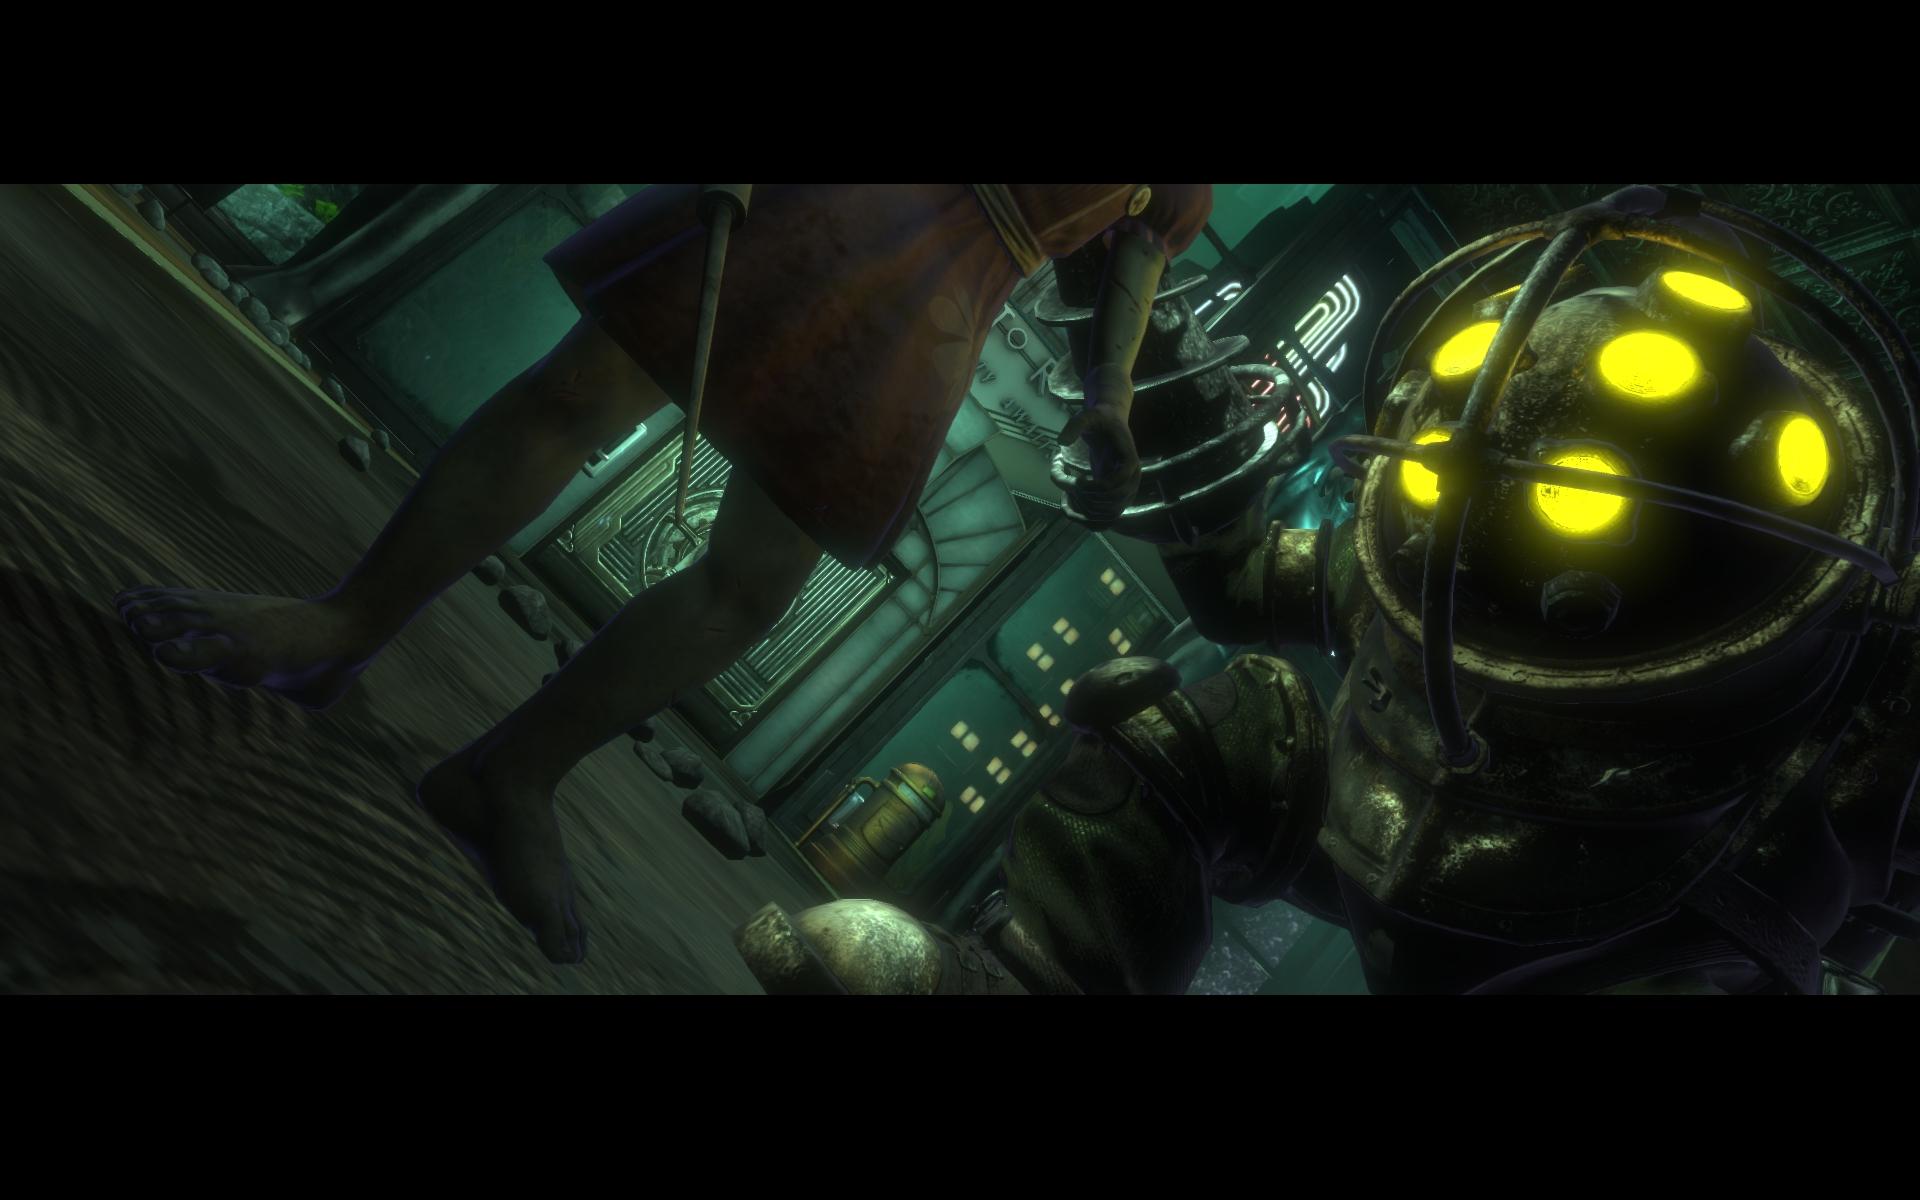 BioShock-The-Collection_2016_06-30-16_004.jpg